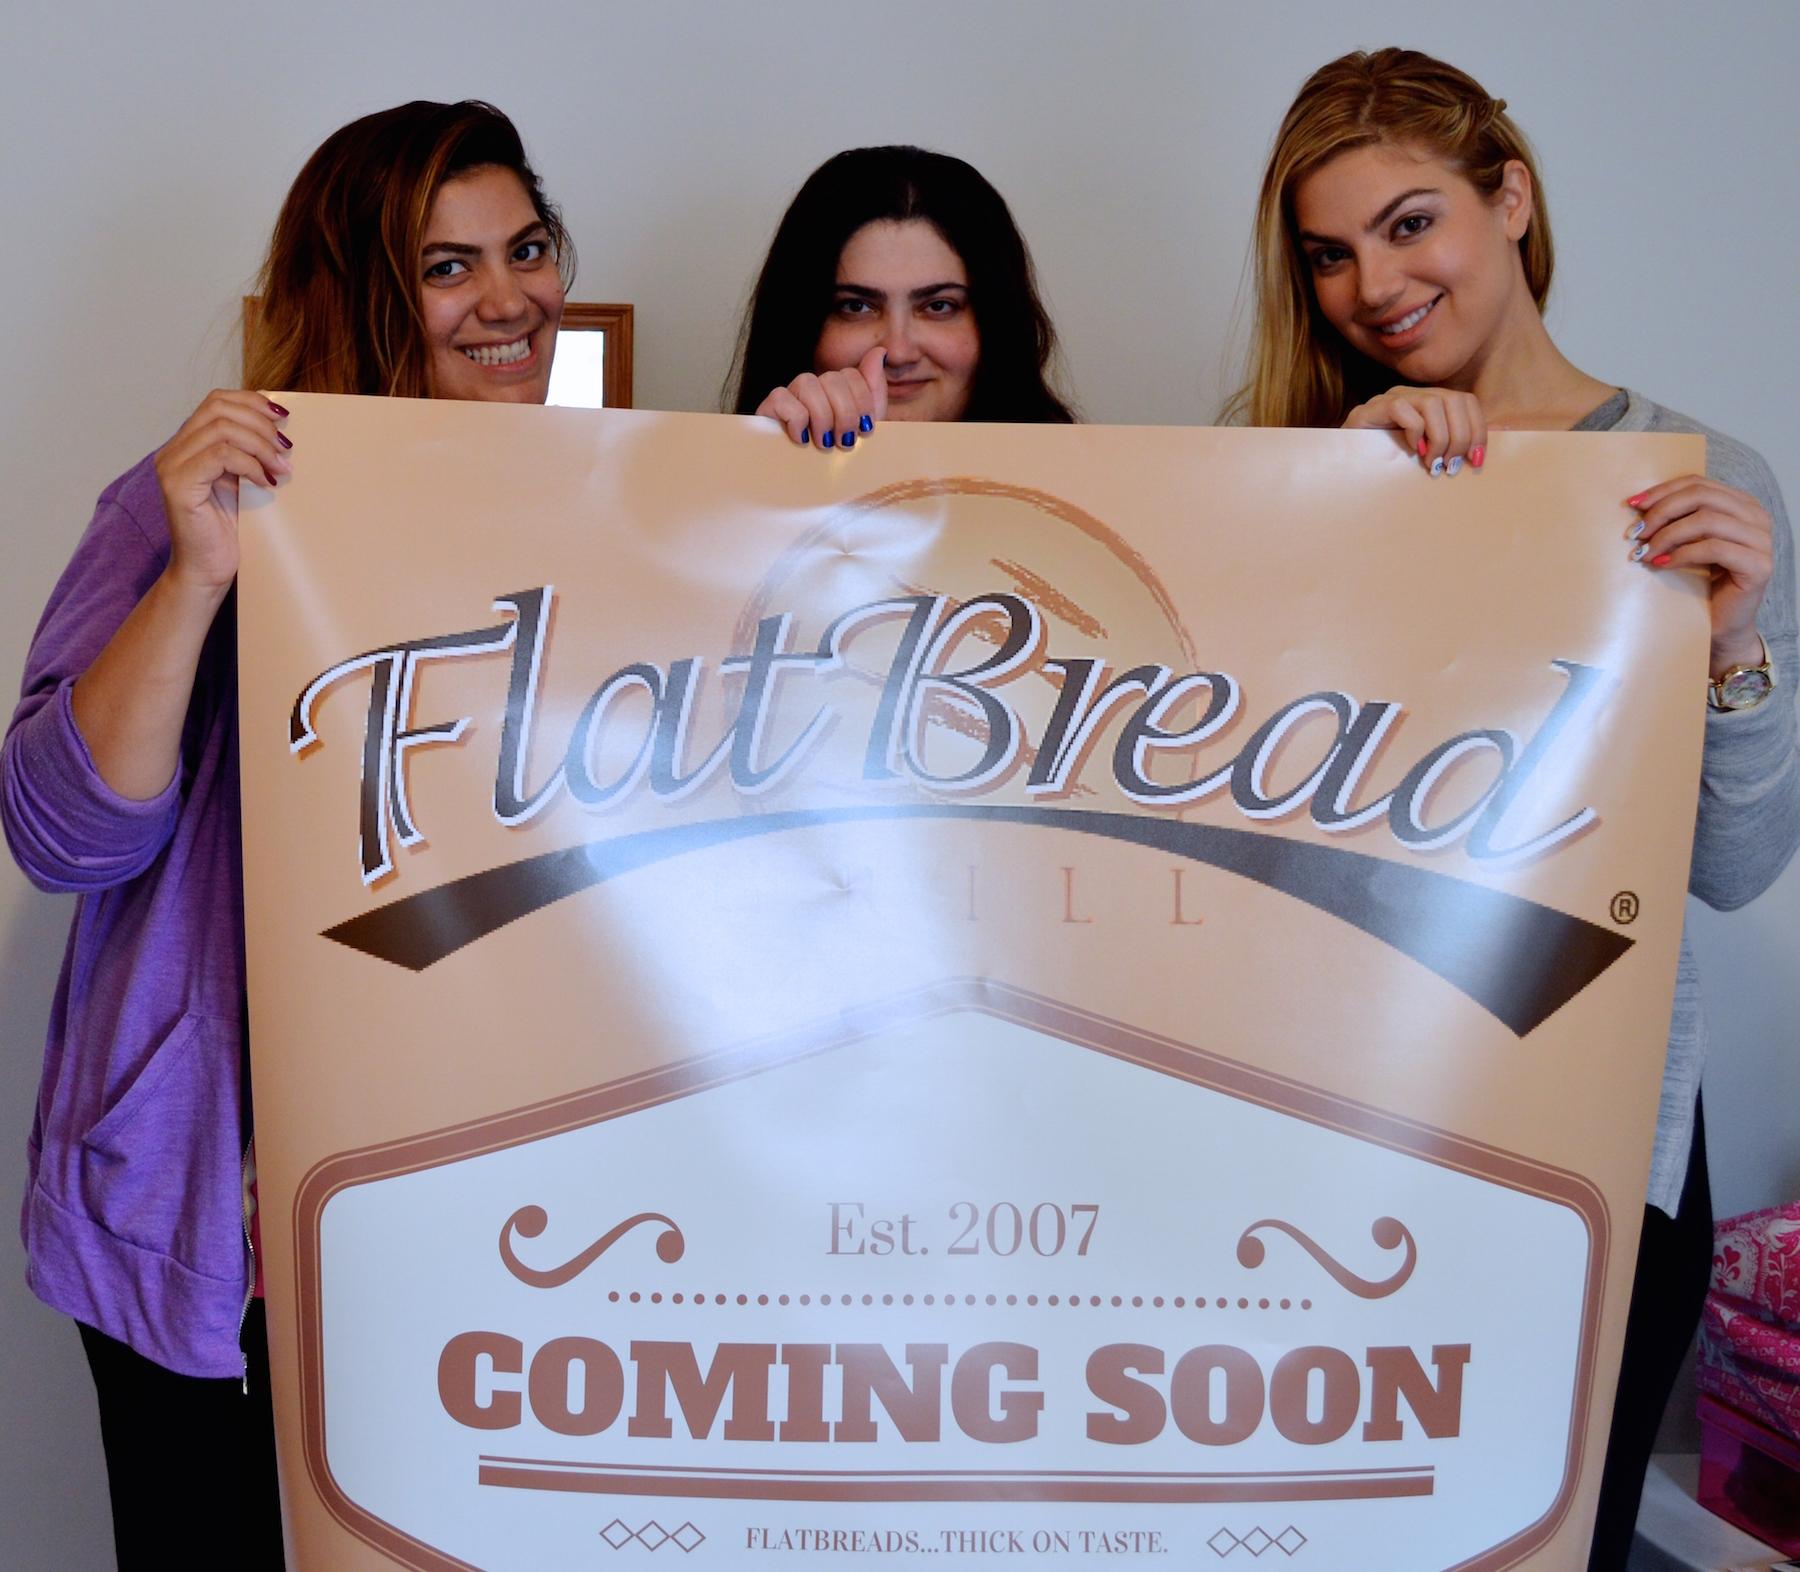 Flatbread_Grill_Hoboken_NJ